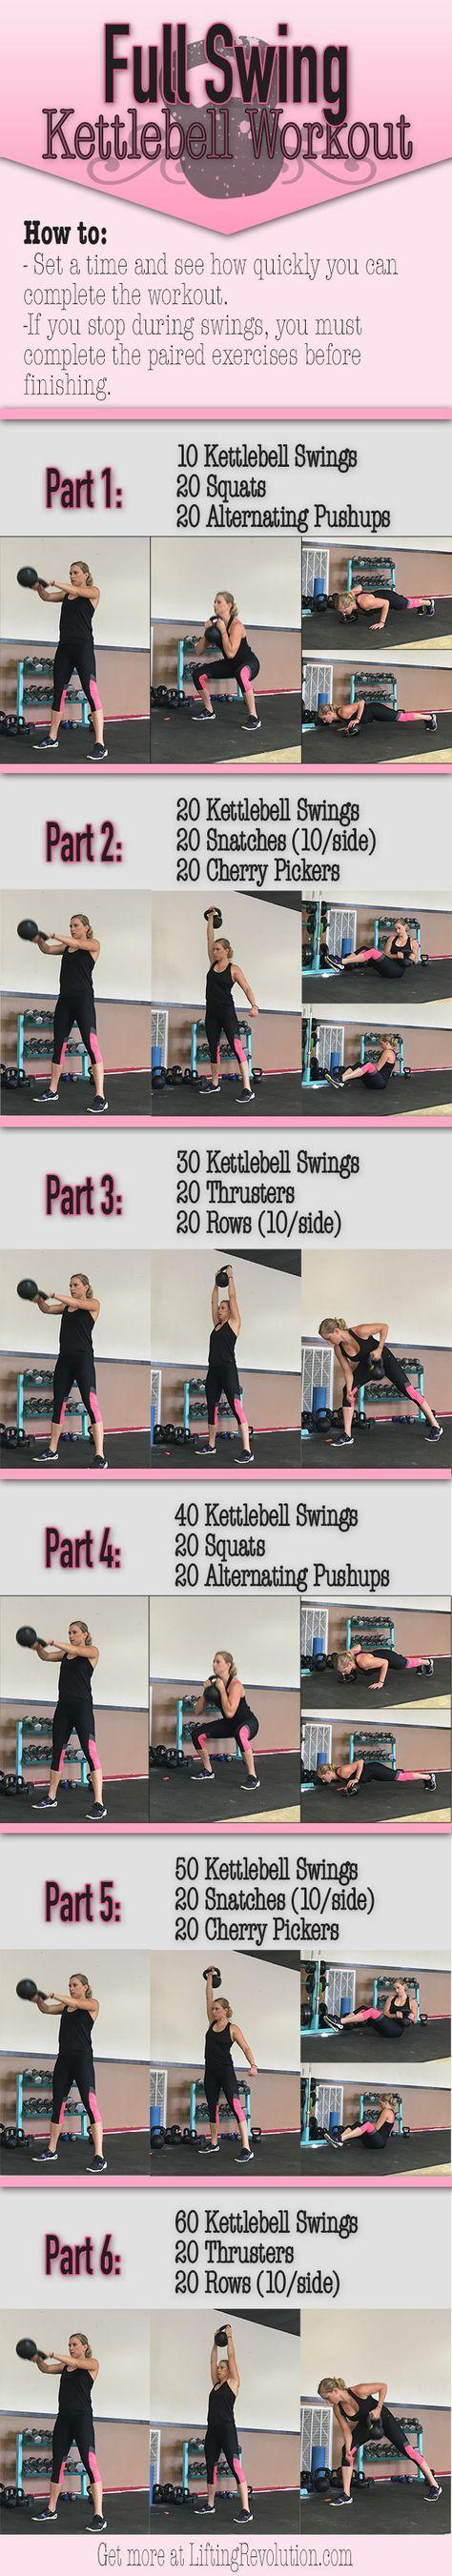 Total Body Kettlebell Workout revolving around heart thumbing swings. #kettlebell #workout